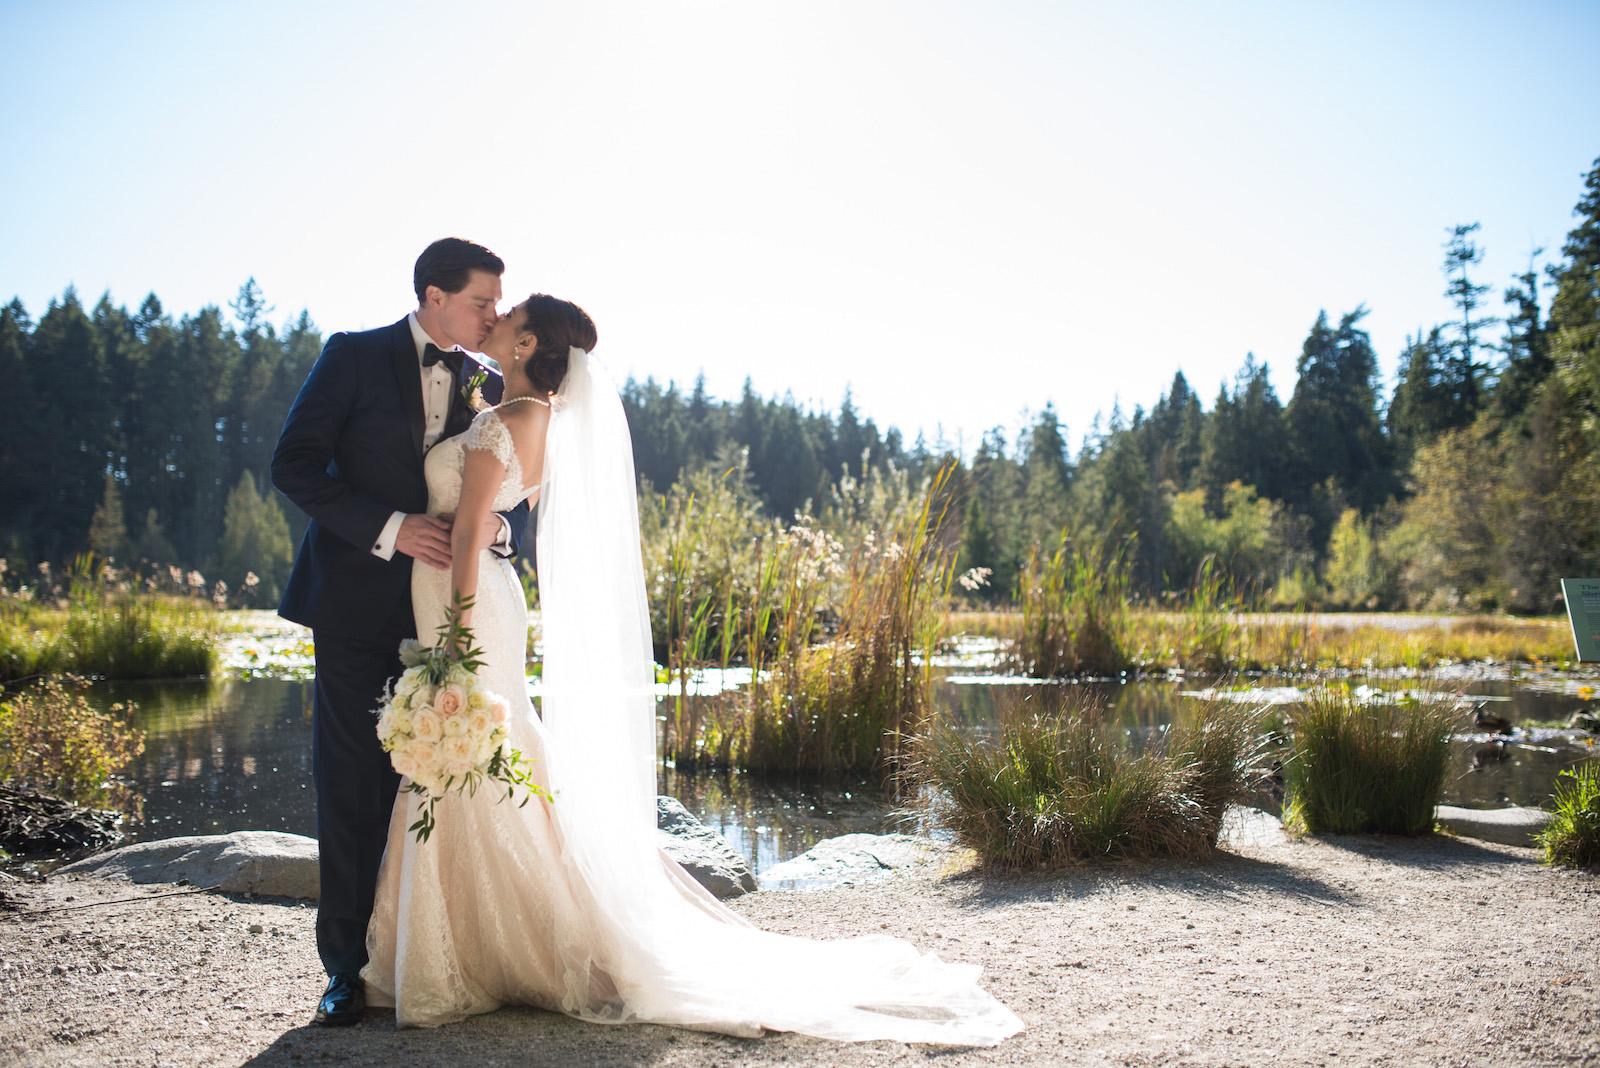 victoria-wedding-photographers-fairmont-pacific-rim-wedding-32.jpg